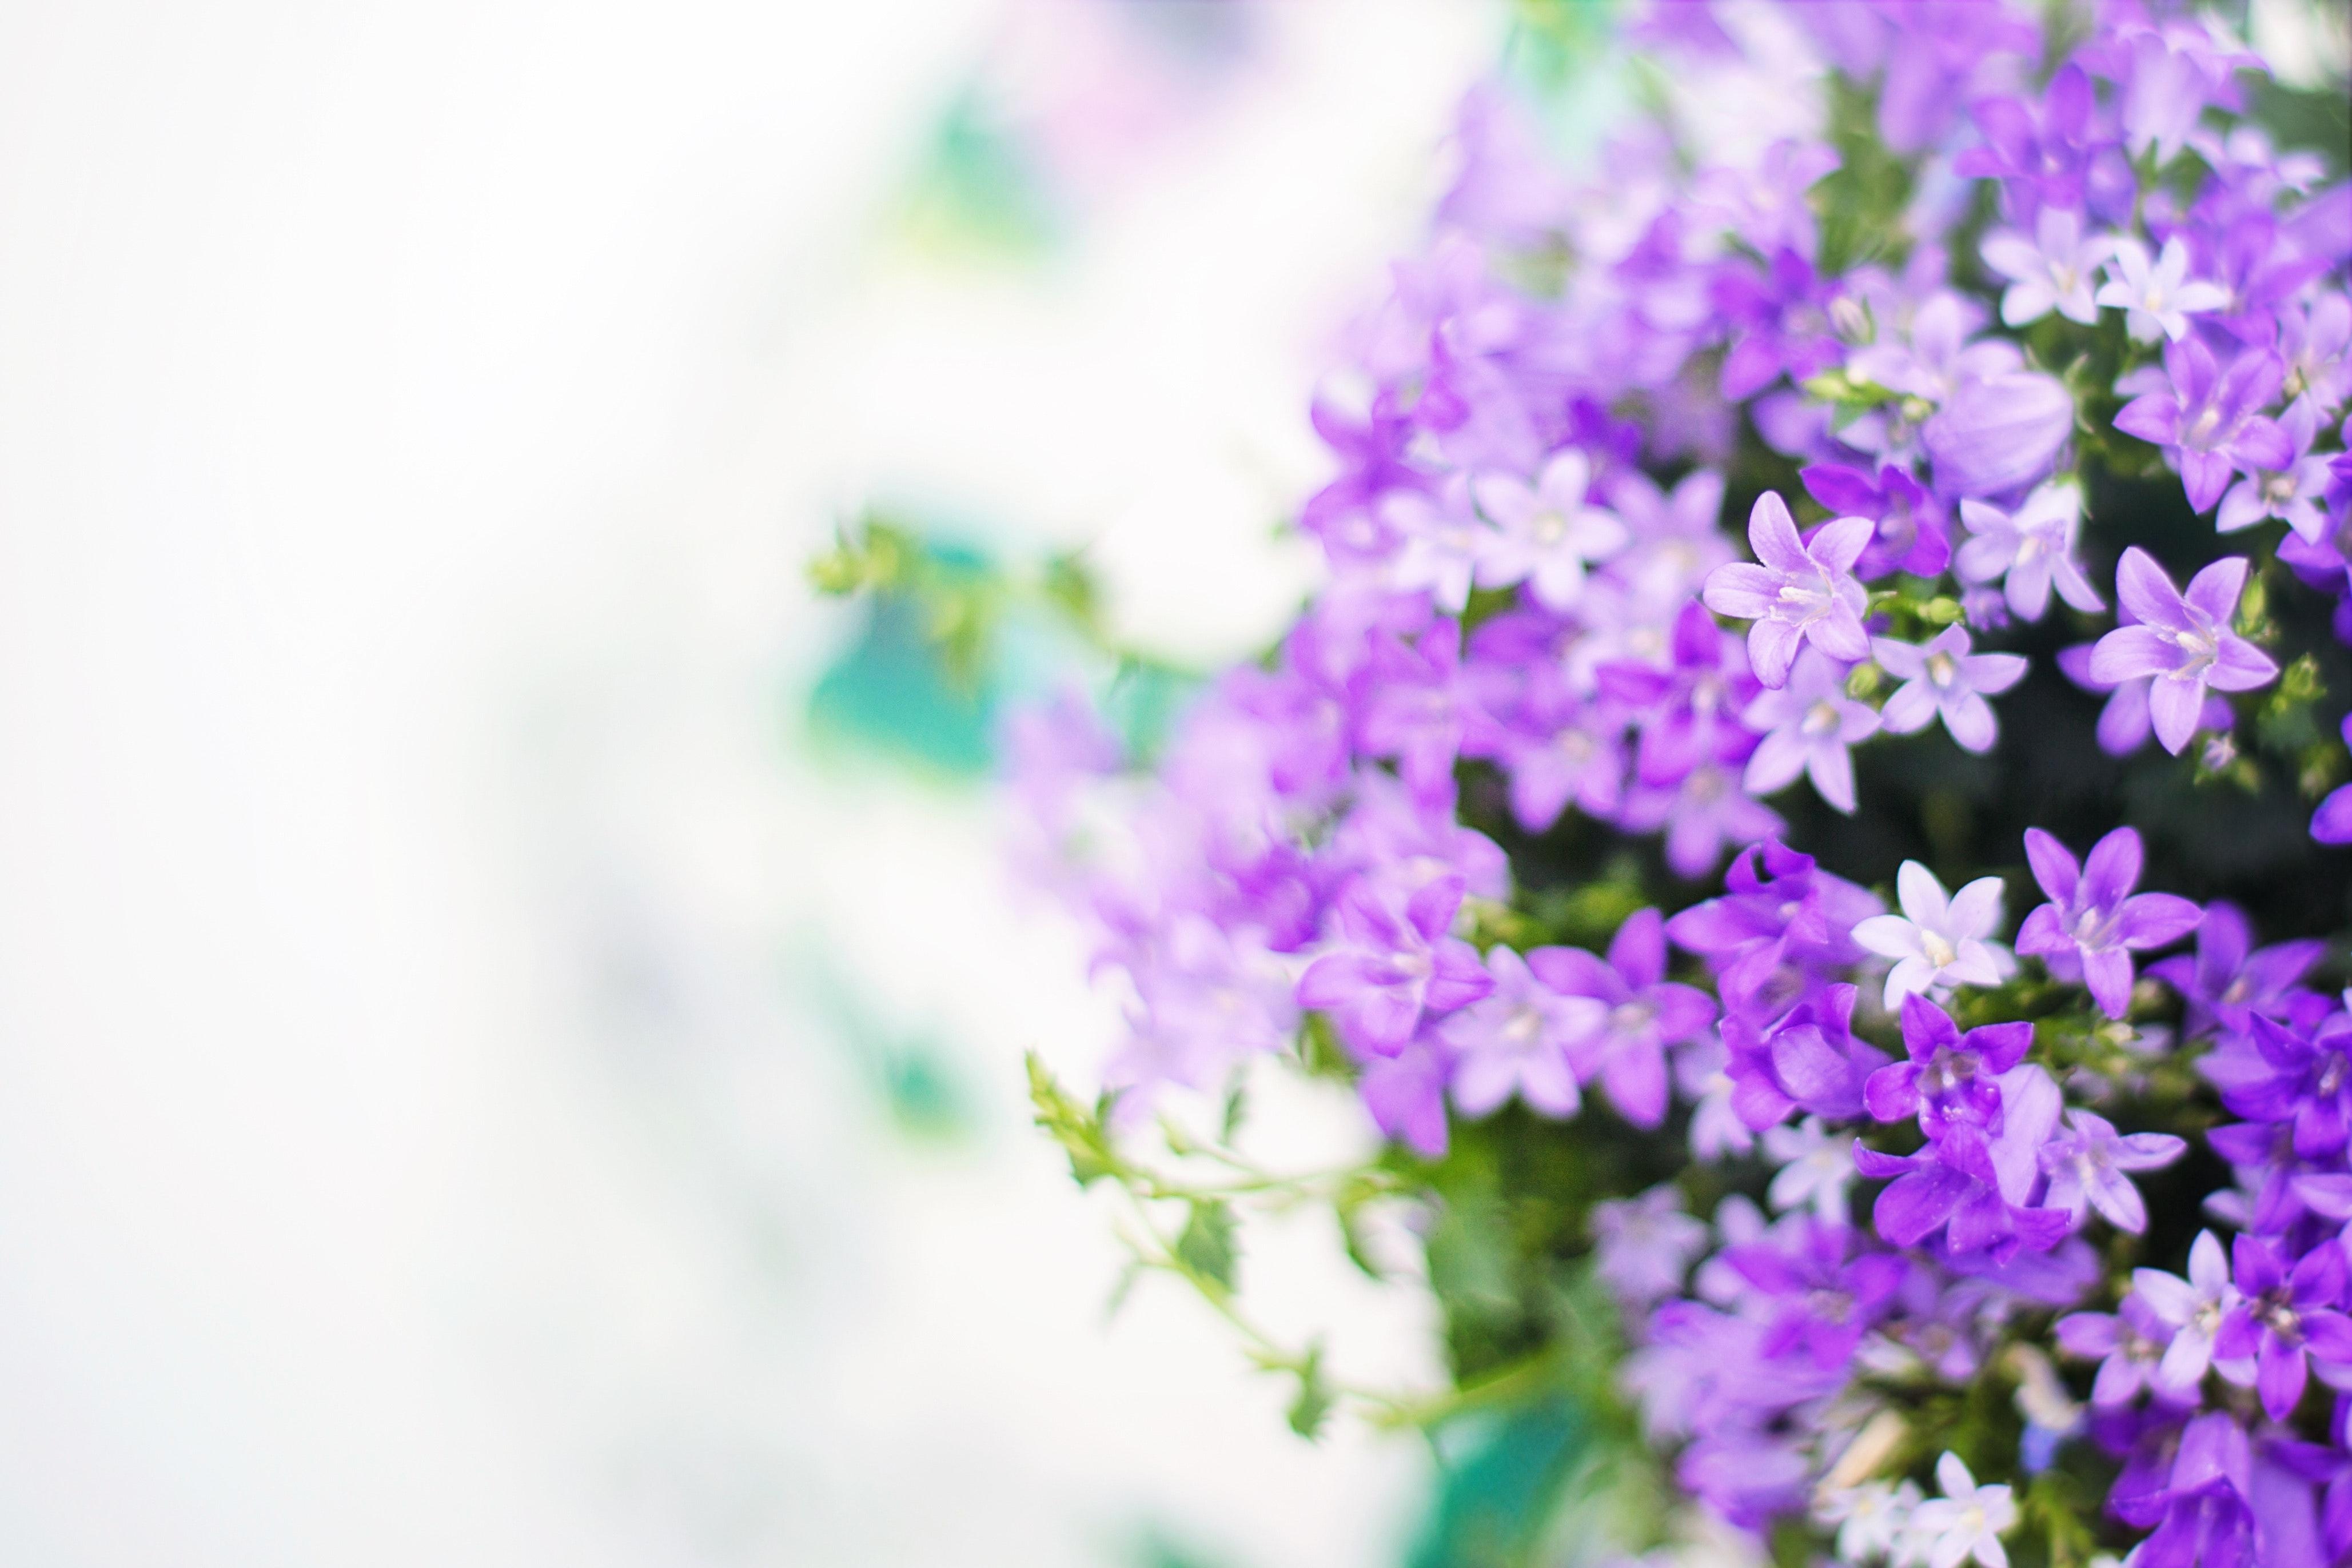 Purple Flowers Pexels Free Stock Photos